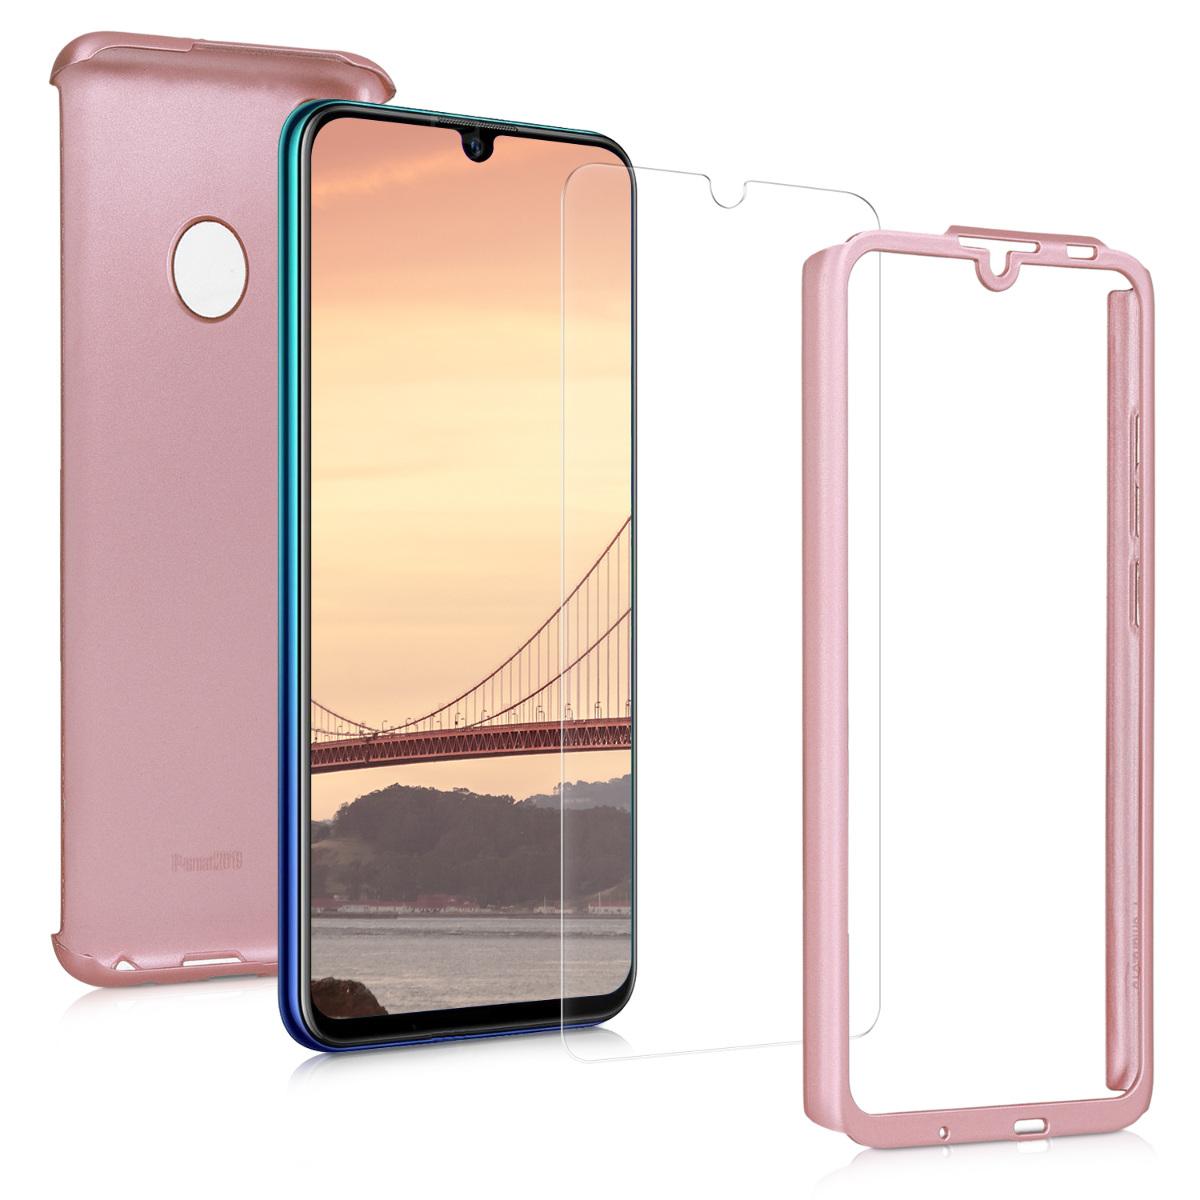 KW Θήκη Full Body with Screen Protector- Huawei P Smart (2019) - Metallic Rose Gold (47391.31)